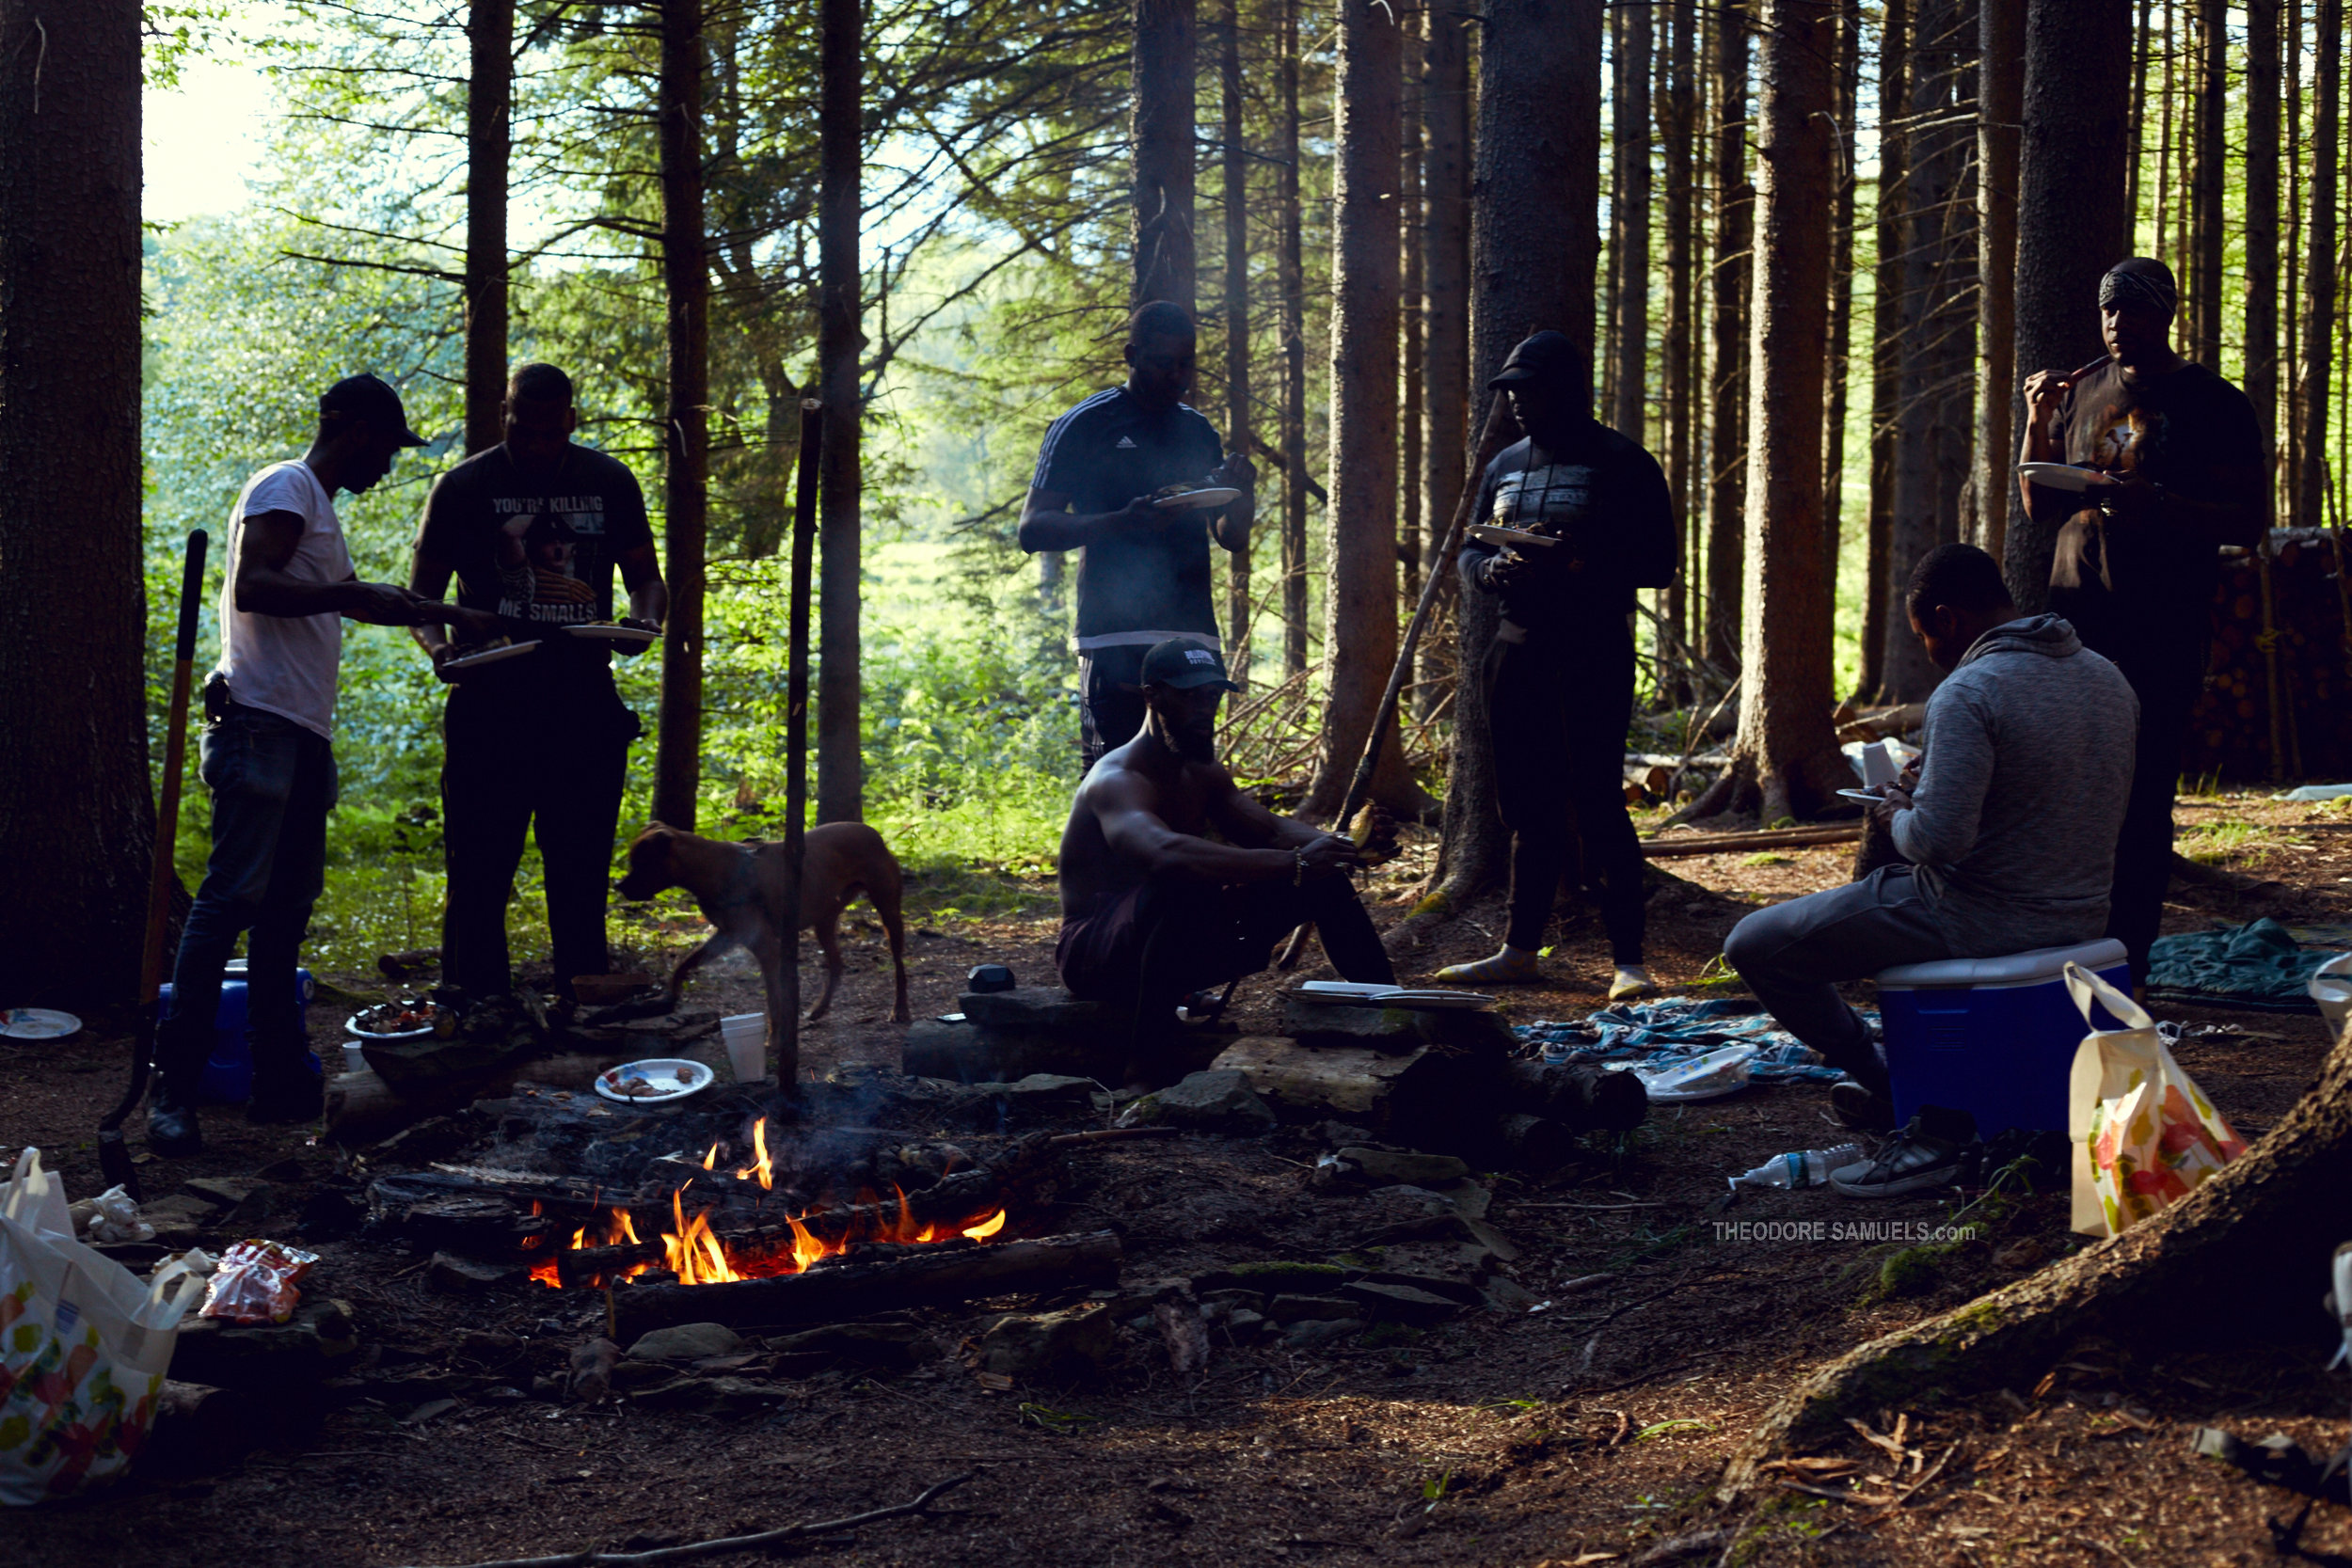 170625_Mastermind Camping_148.jpg